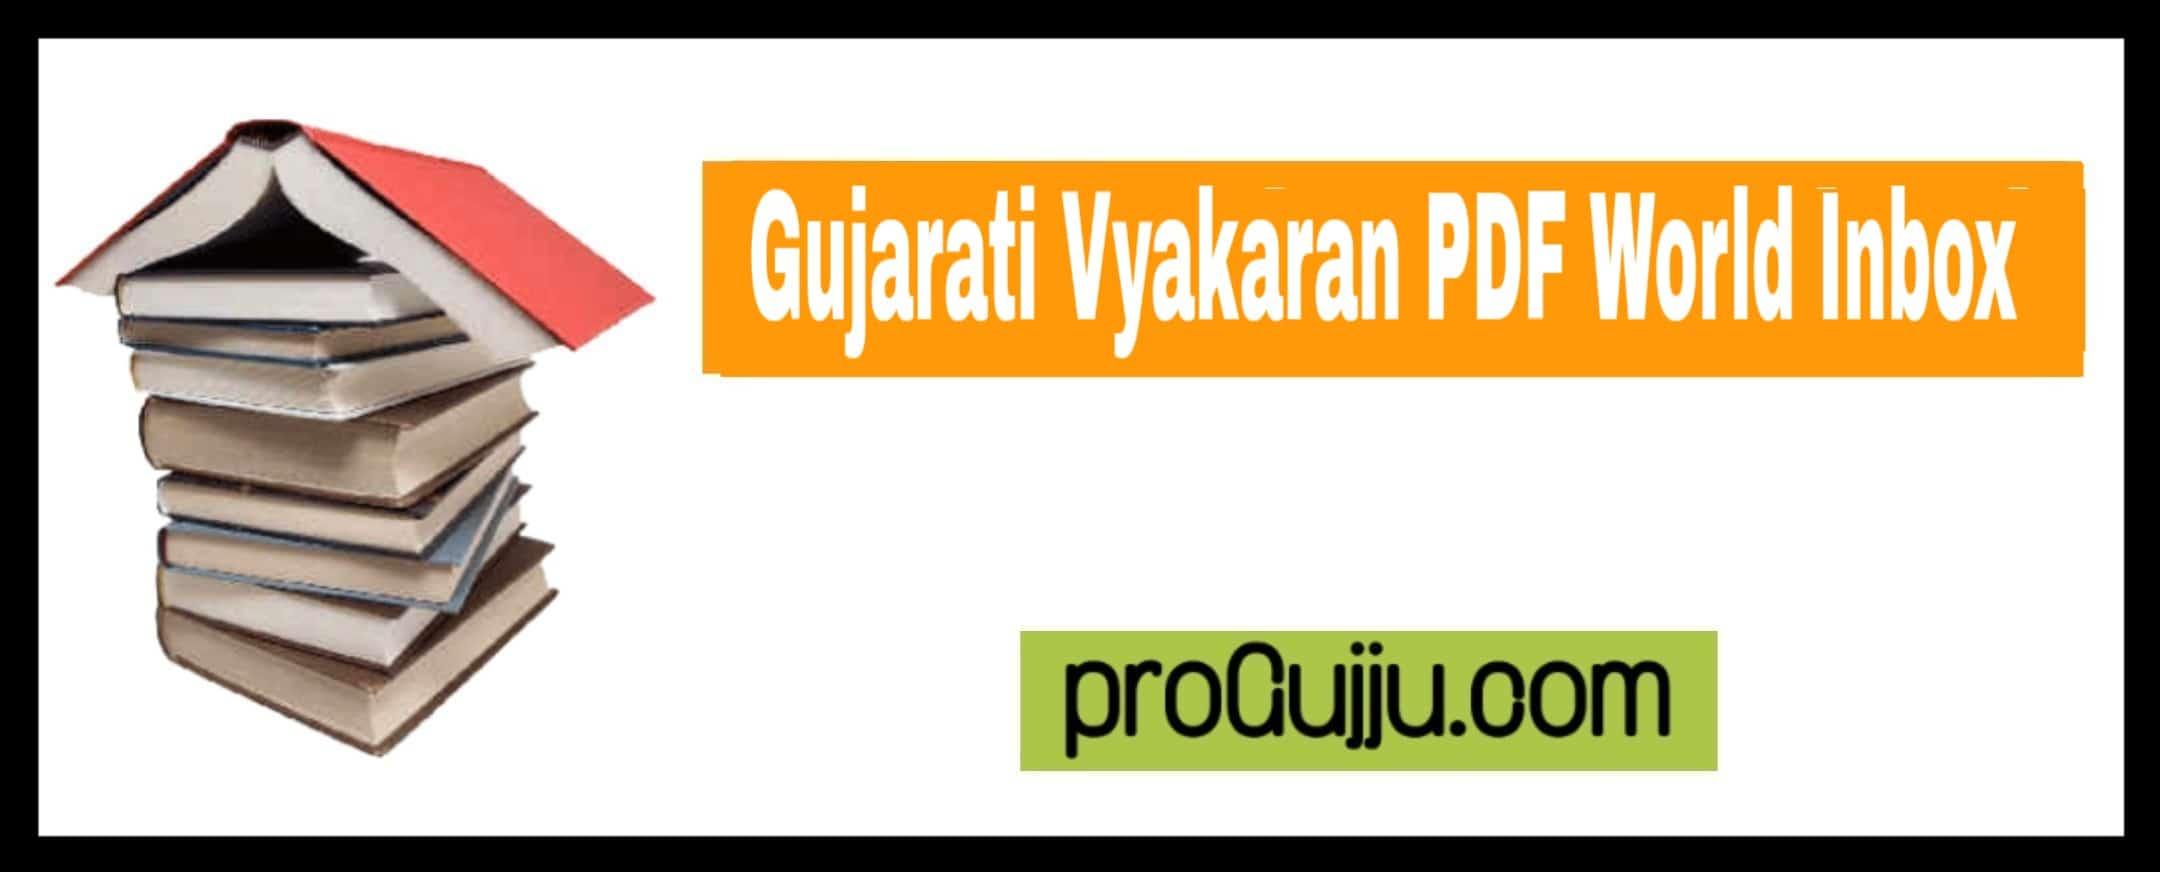 Gujarati vyakaran Pdf World Inbox